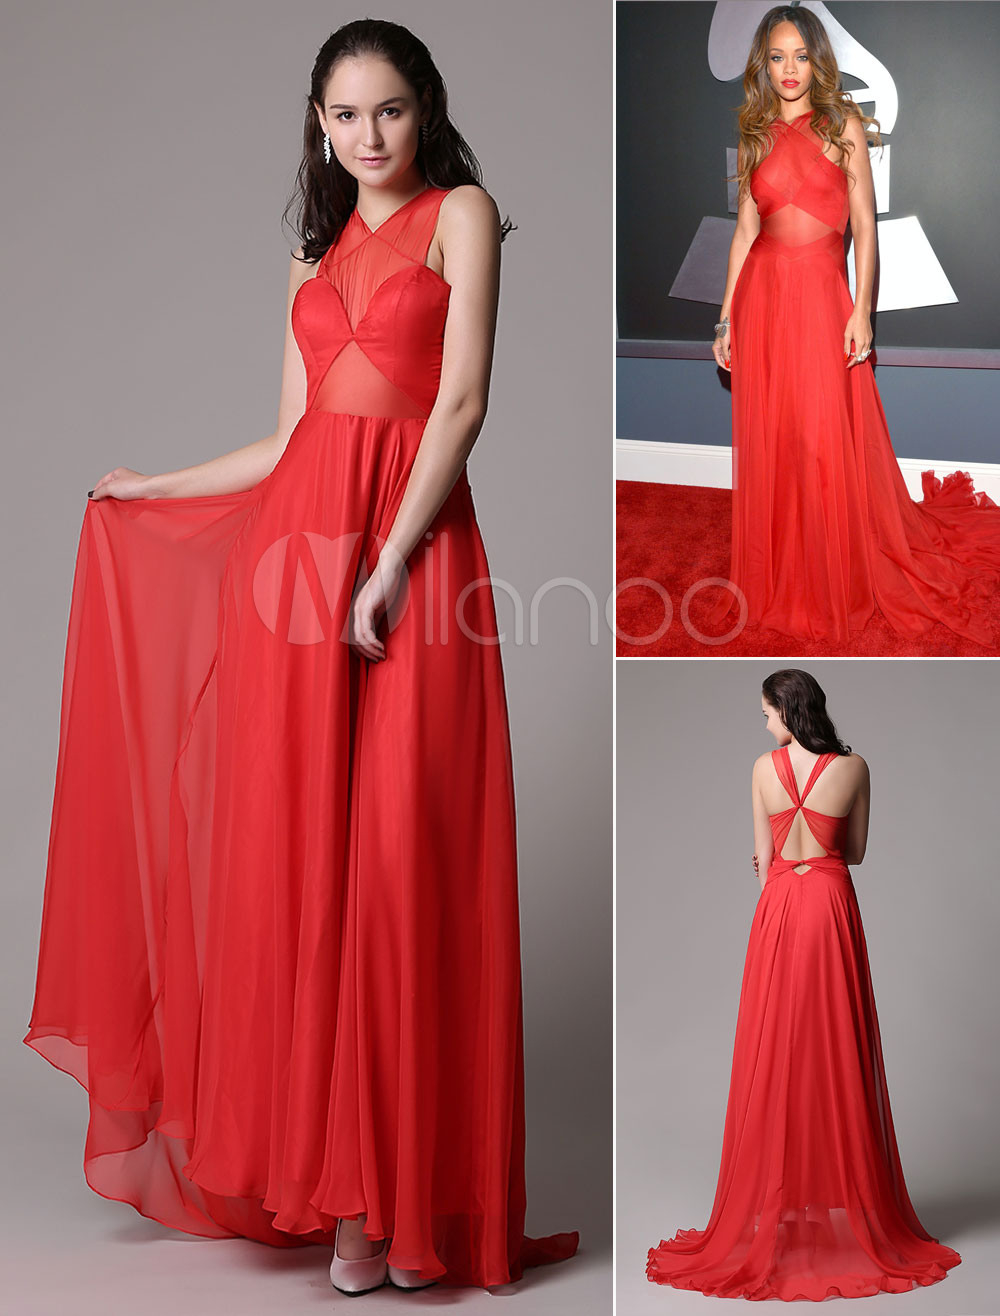 Formal Elegant Rote Abend Kleid Design20 Wunderbar Rote Abend Kleid Spezialgebiet